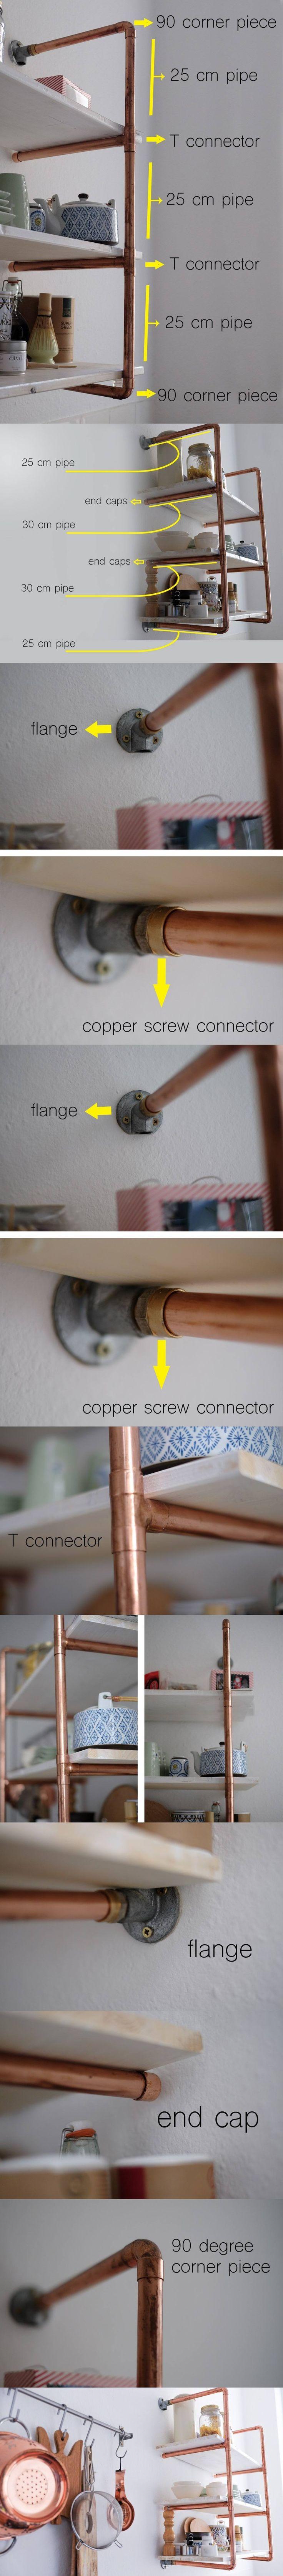 Estantería DIY con tubos de cobre